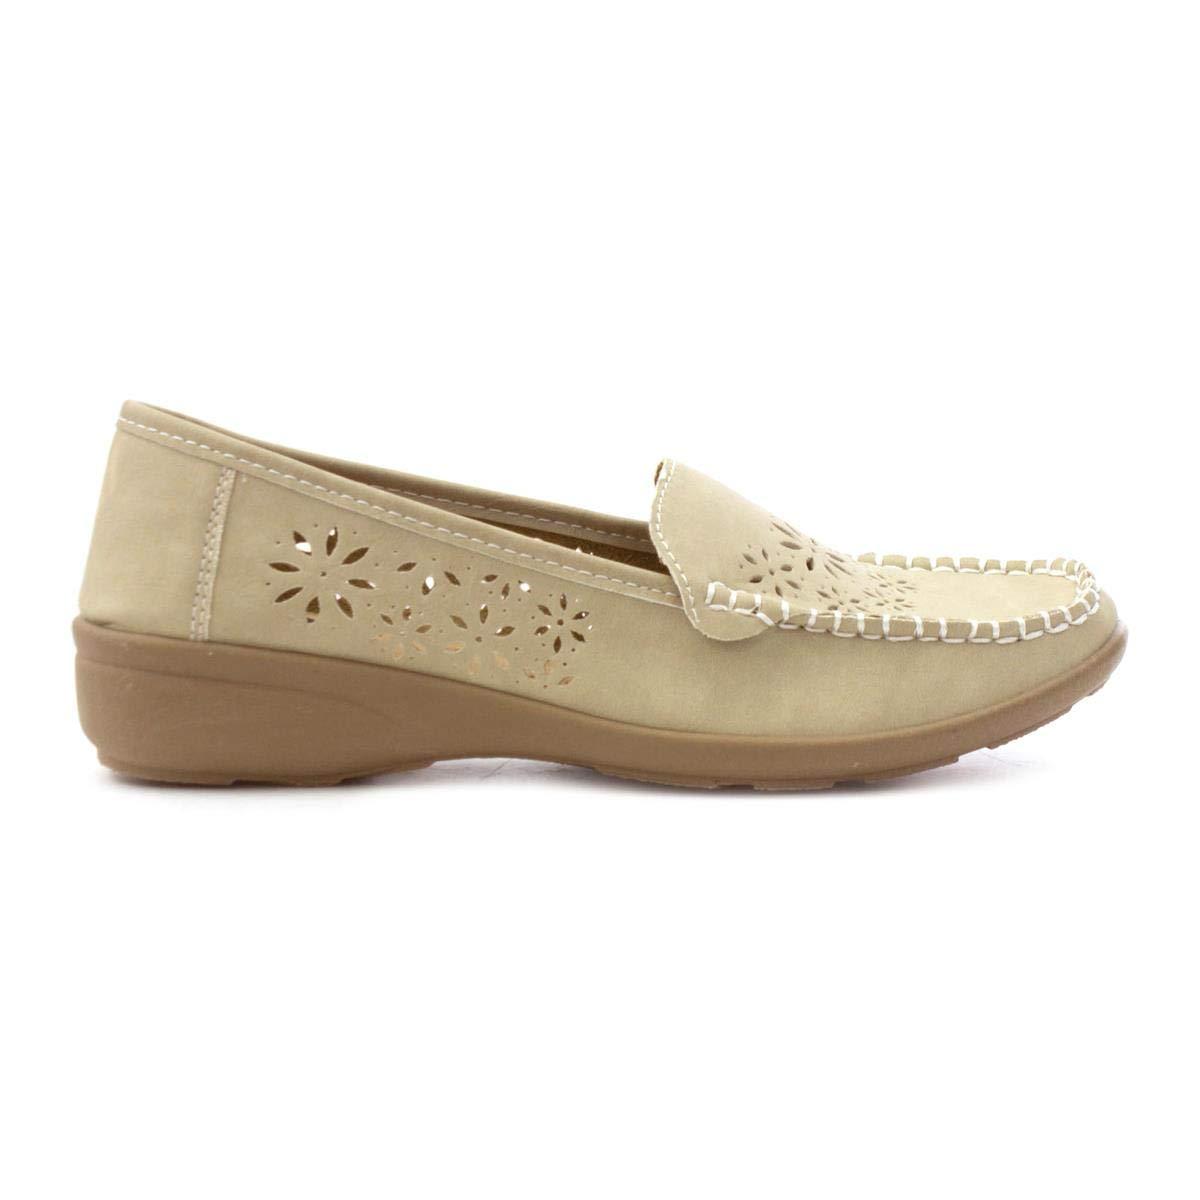 Softlites Womens Beige Casual Loafer Shoe SOFT-LITES